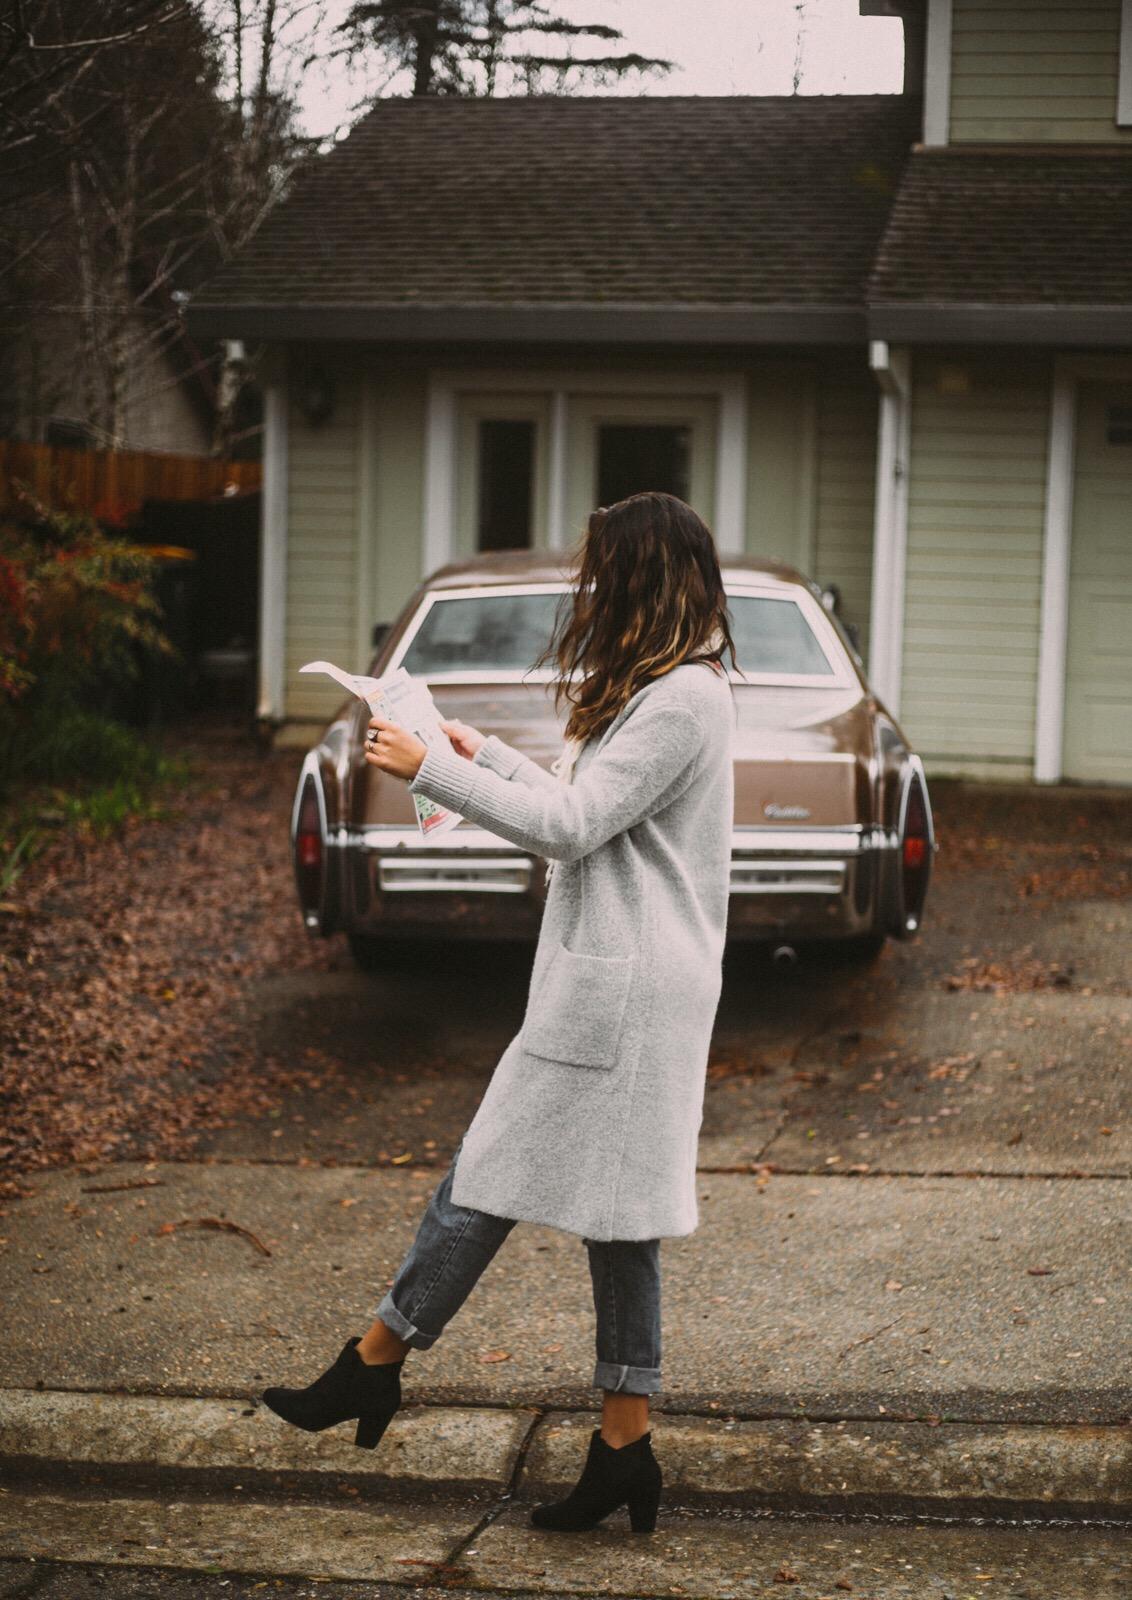 woman walking along curb